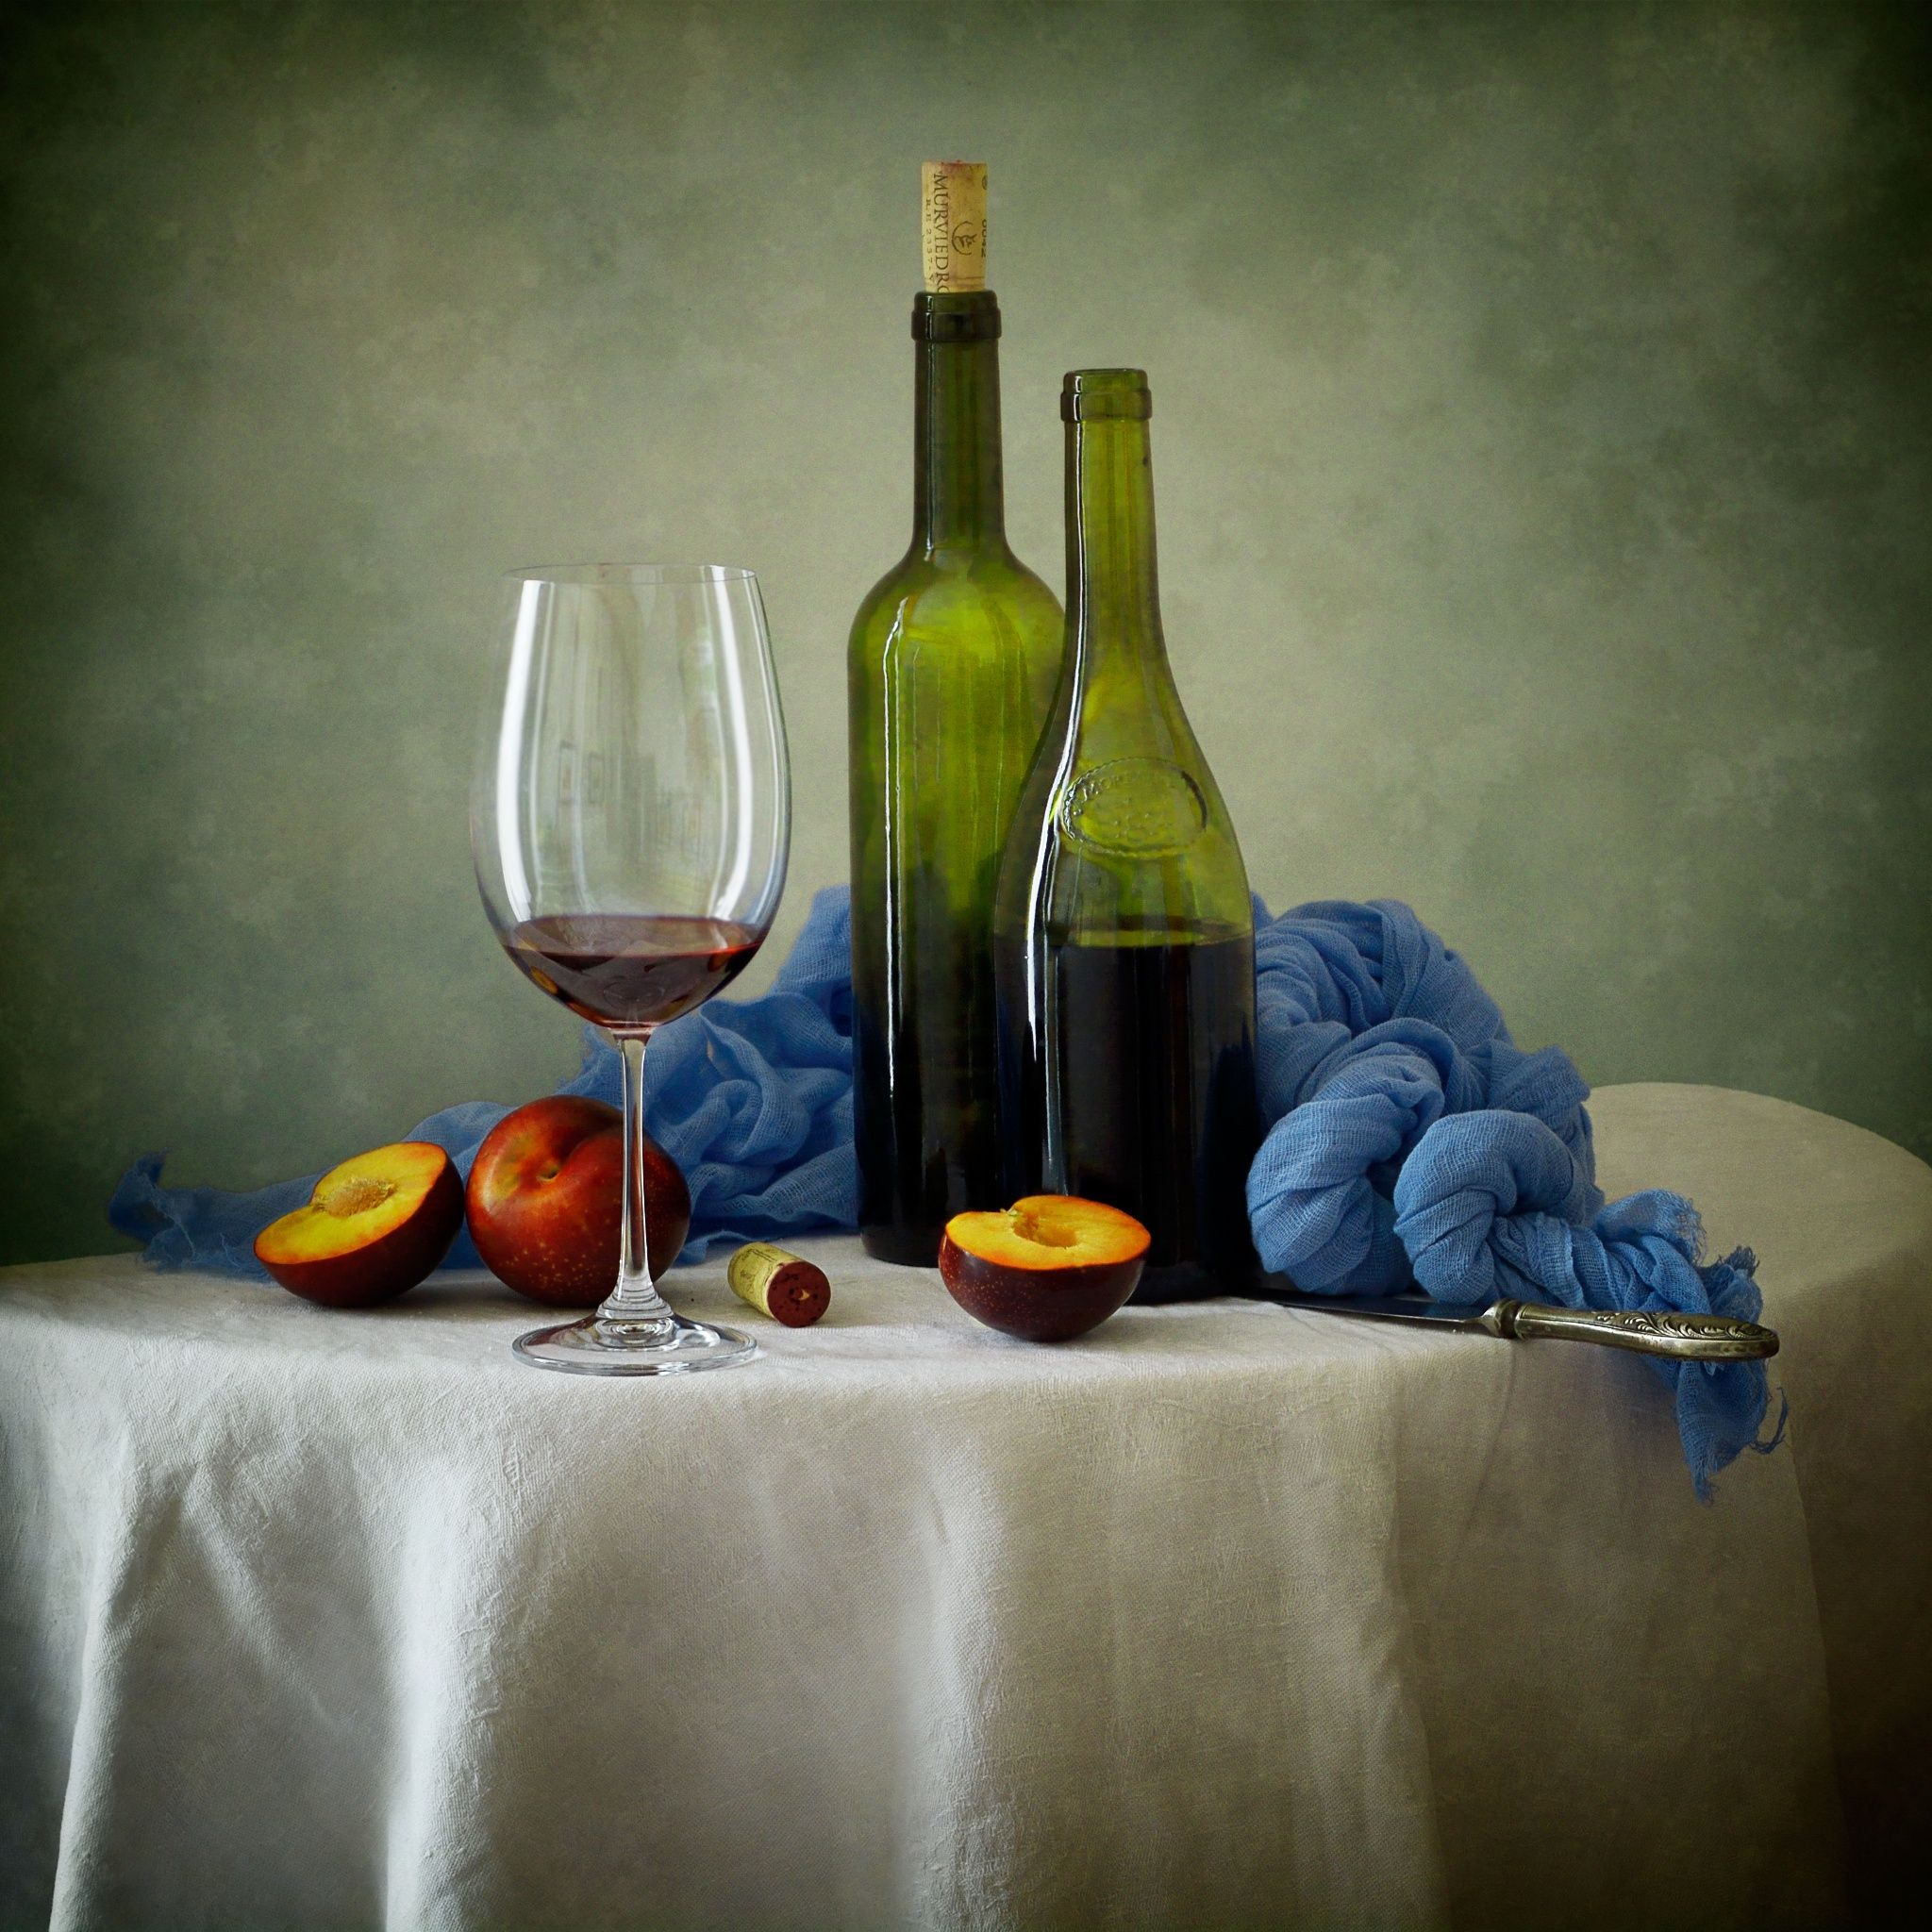 Still Life (50) | Peonies art print, Peony art, Art prints